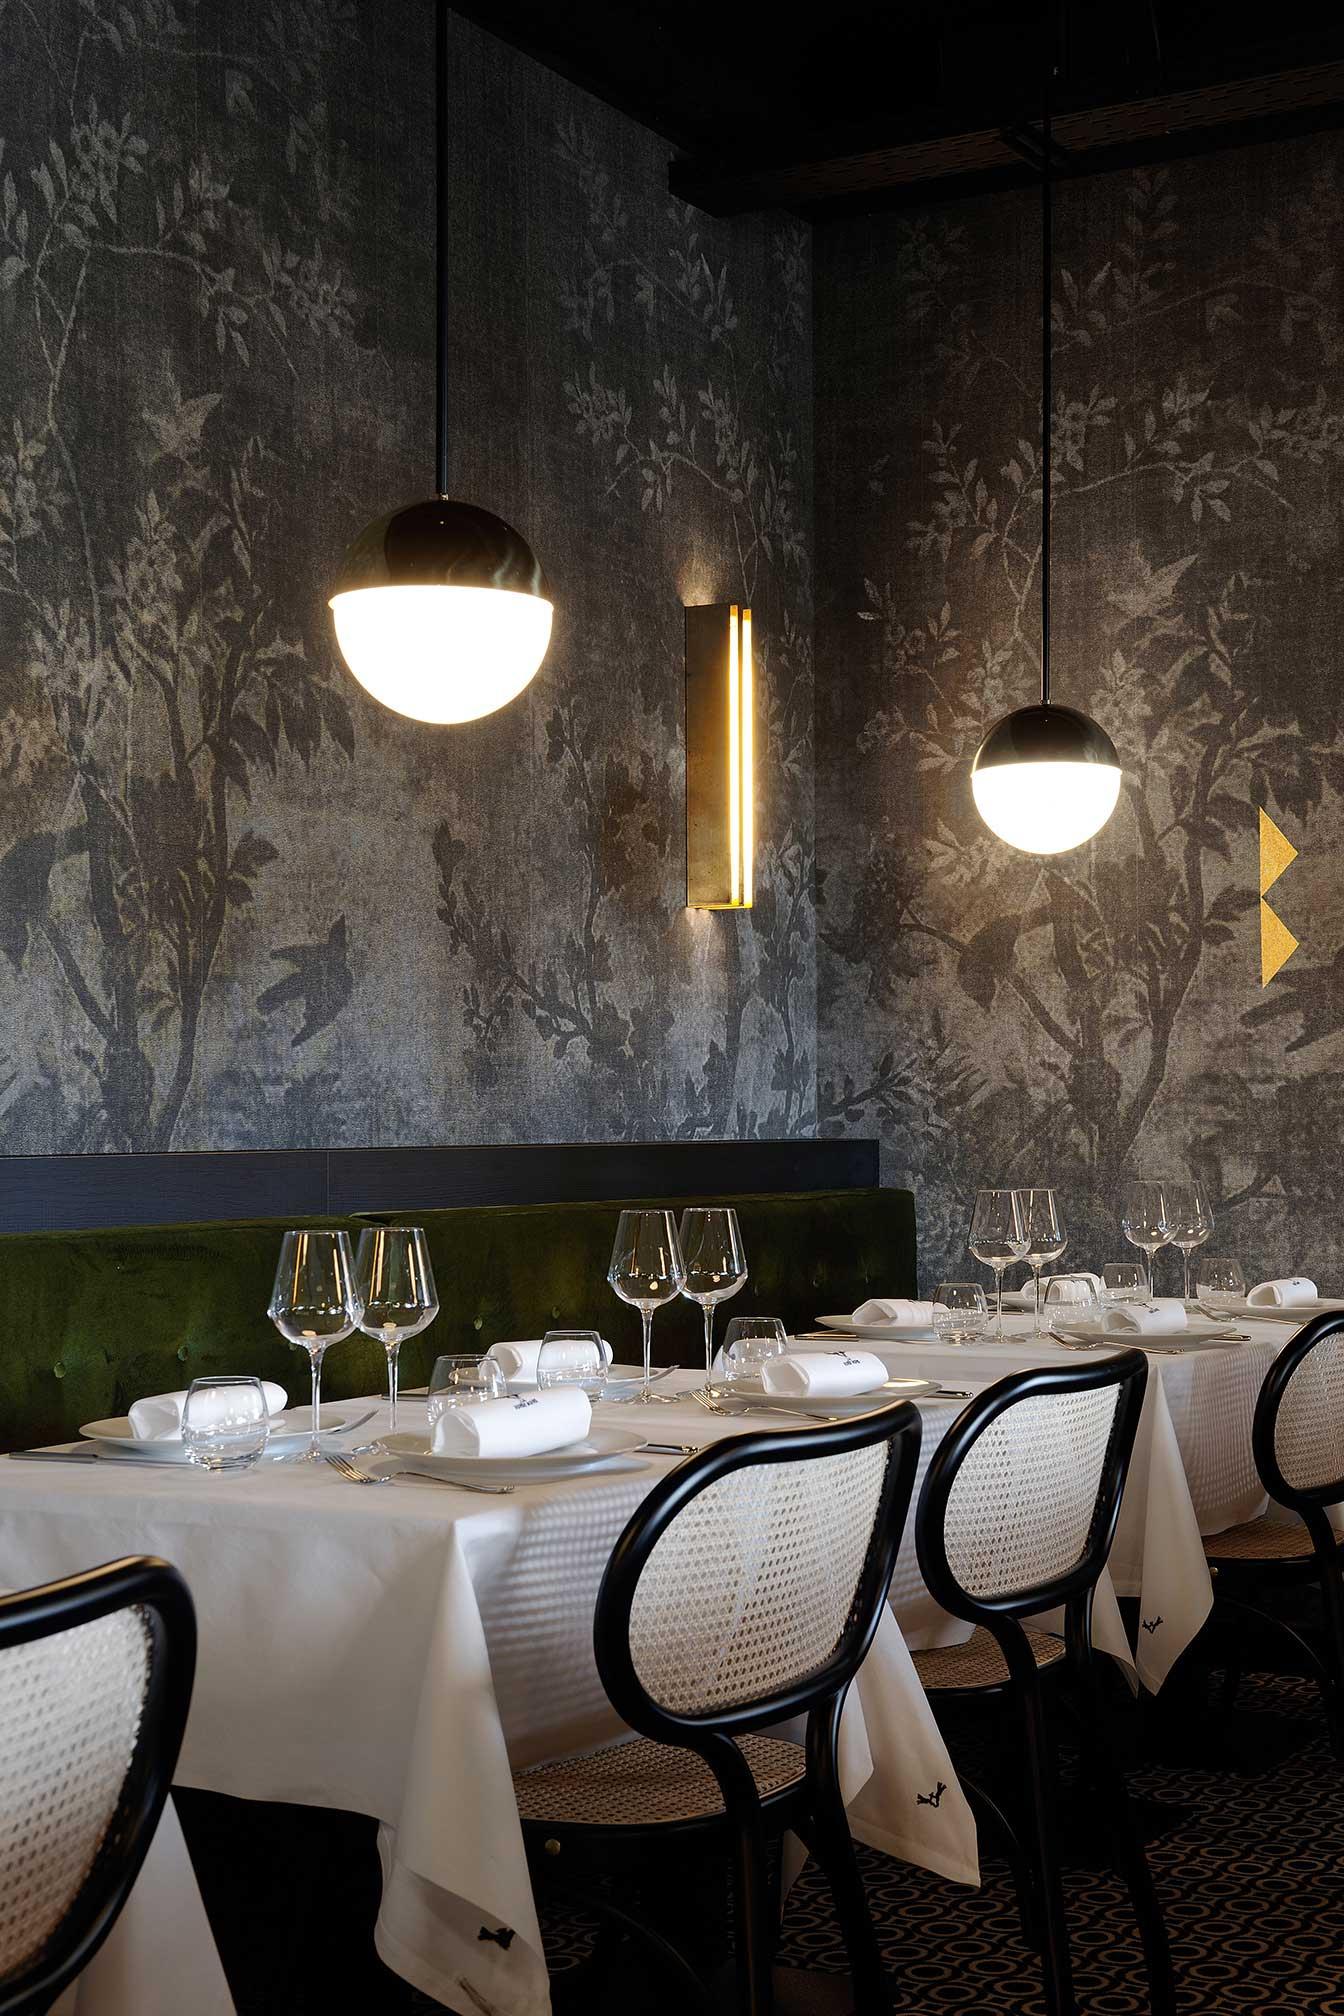 La Foret Noire Restaurant in Chaponost, France by Claude Cartier Studio | Yellowtrace